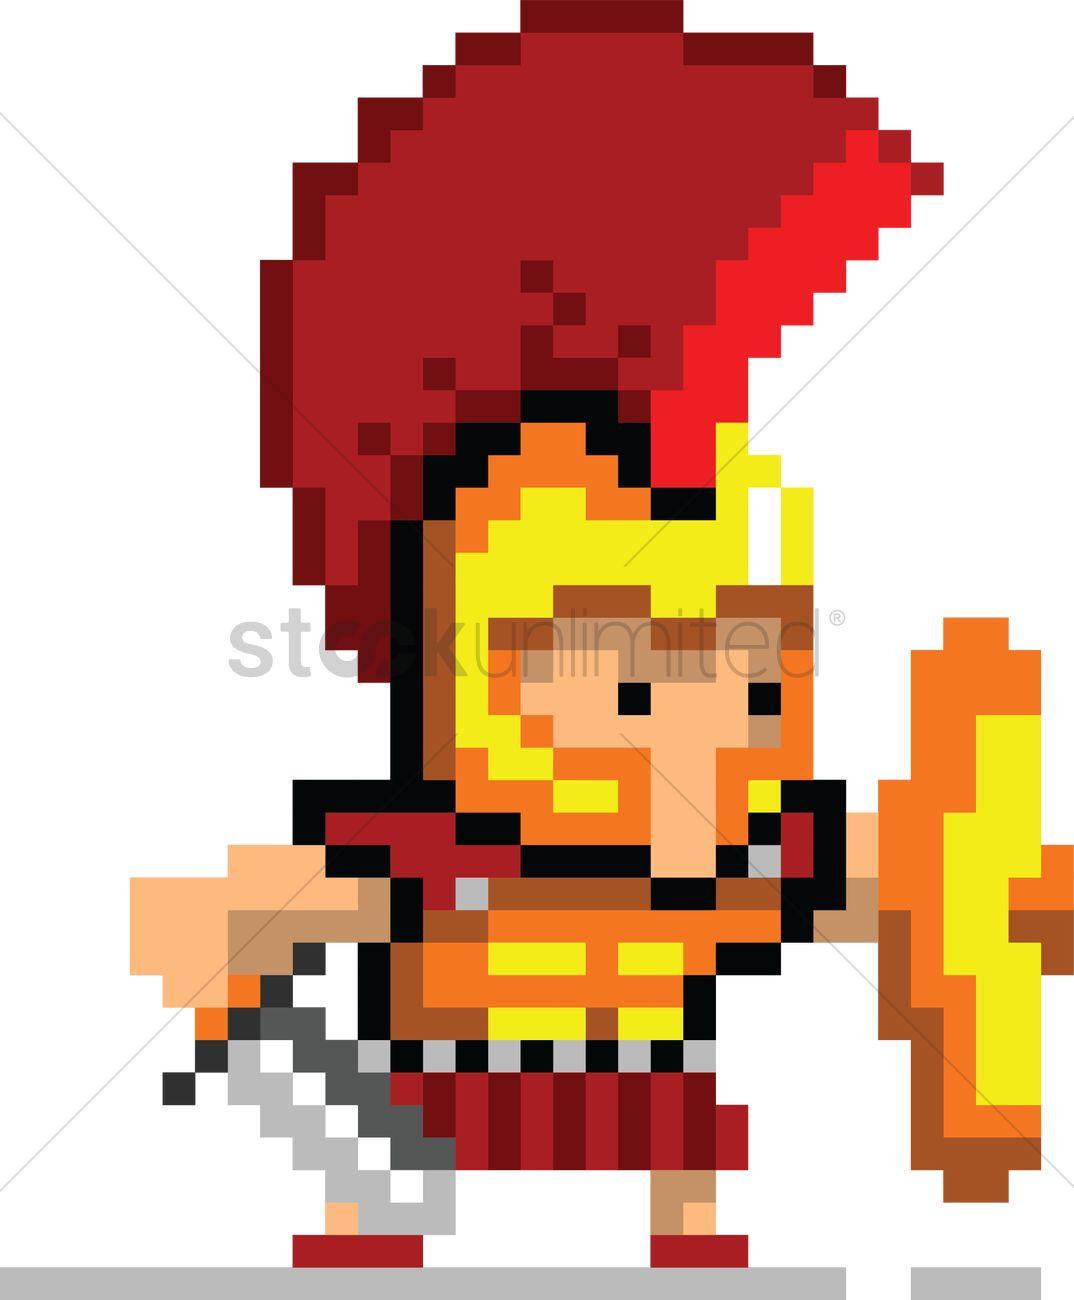 Pixel Art Gaming Character Vector Image 2022335